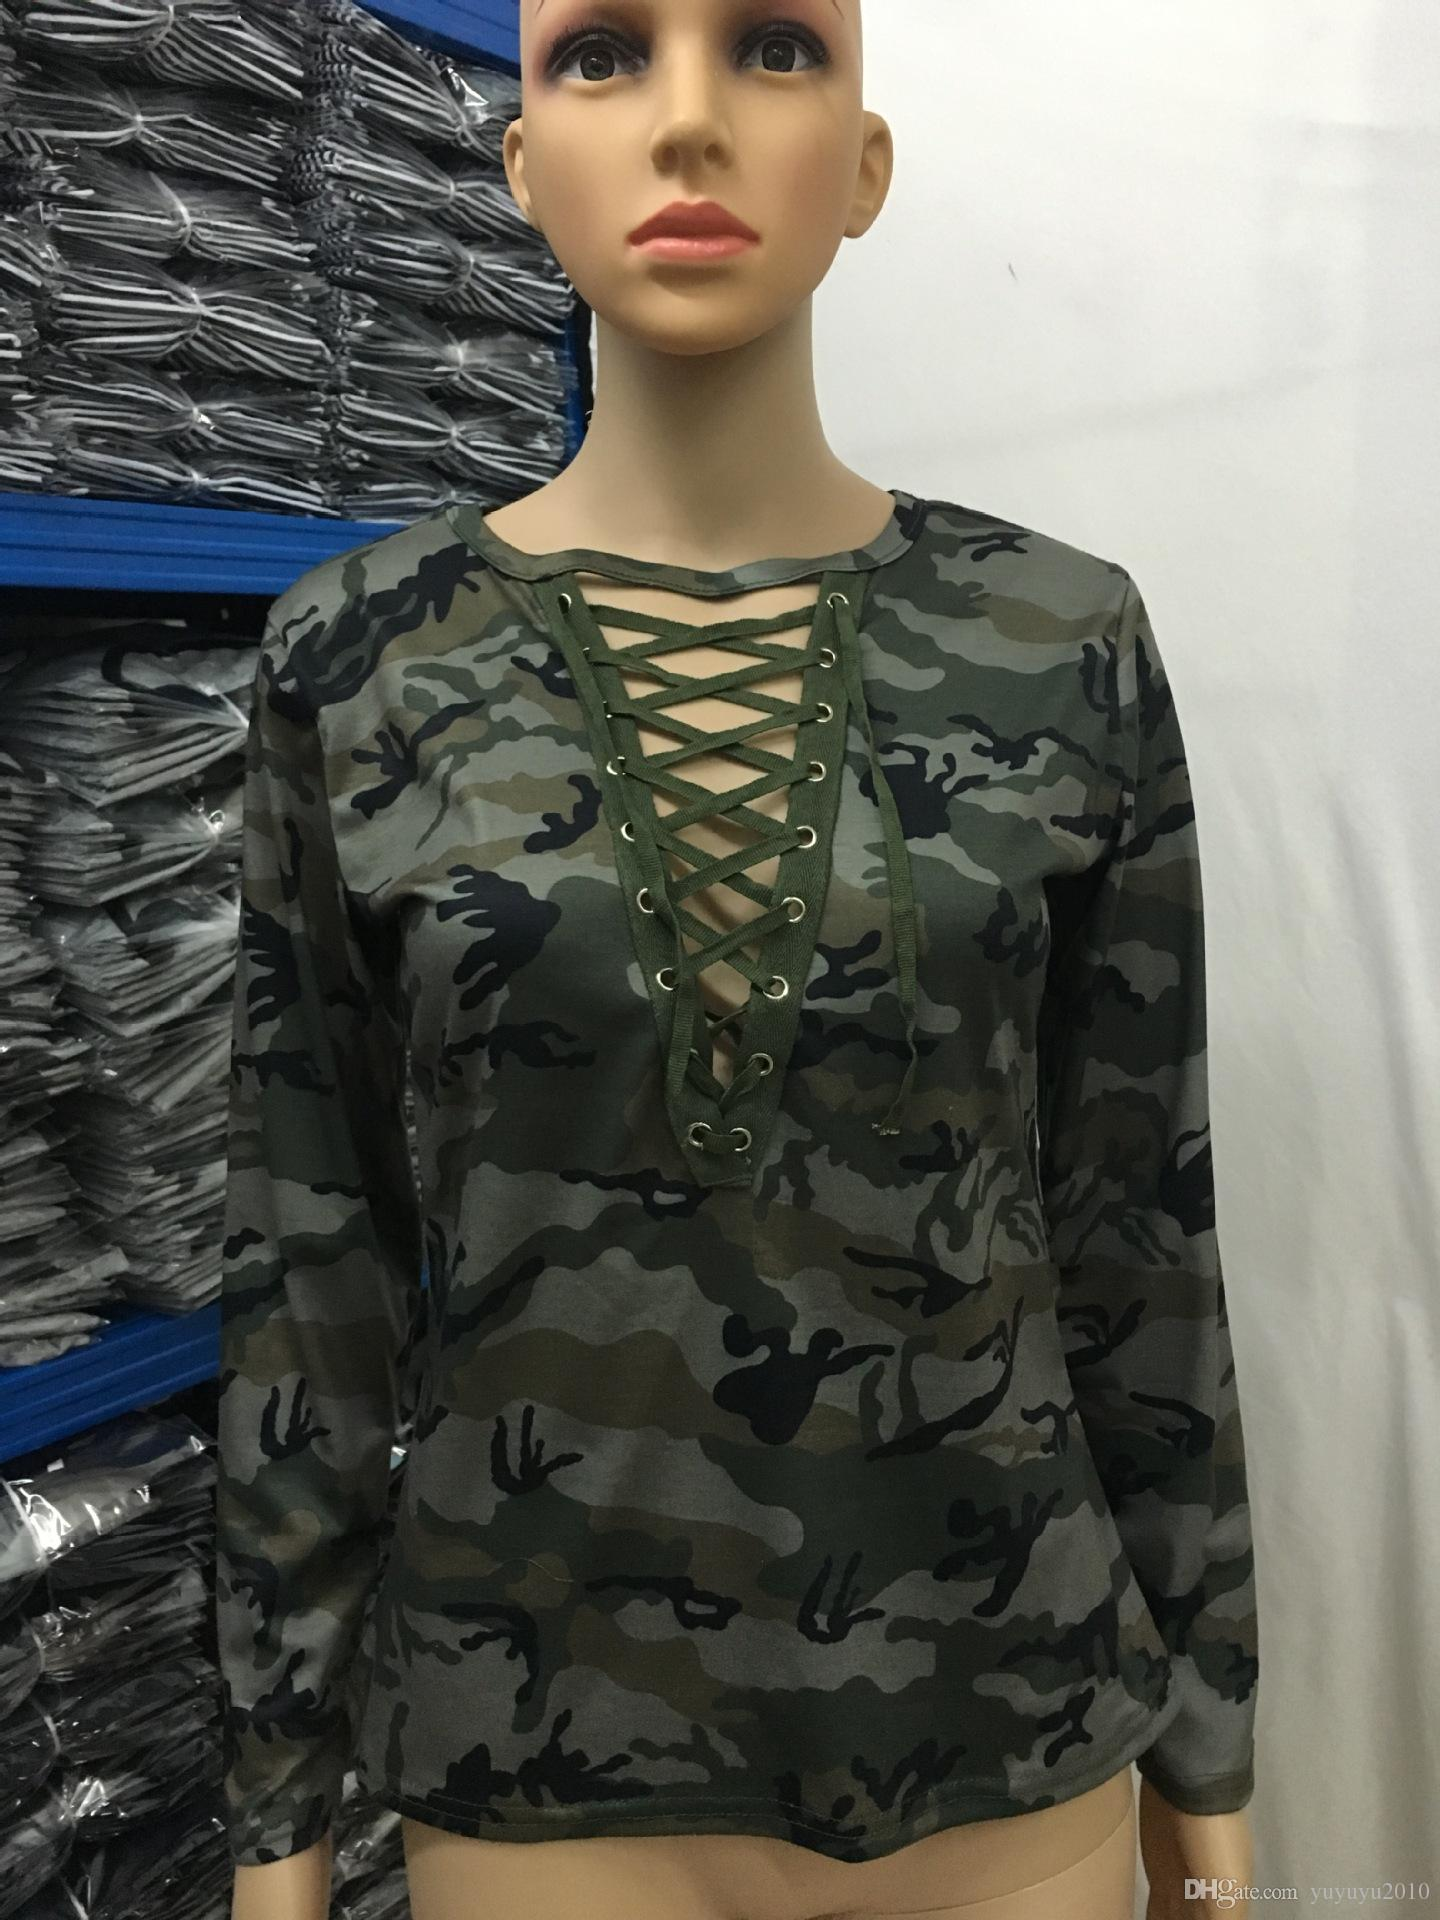 HOT SALE! 2017 Autumn Army Green Camouflage Print Sweatshirt For Women Dark Camo Lace Up Crew Neck Ribbons Casual Tee Roupas Feminino